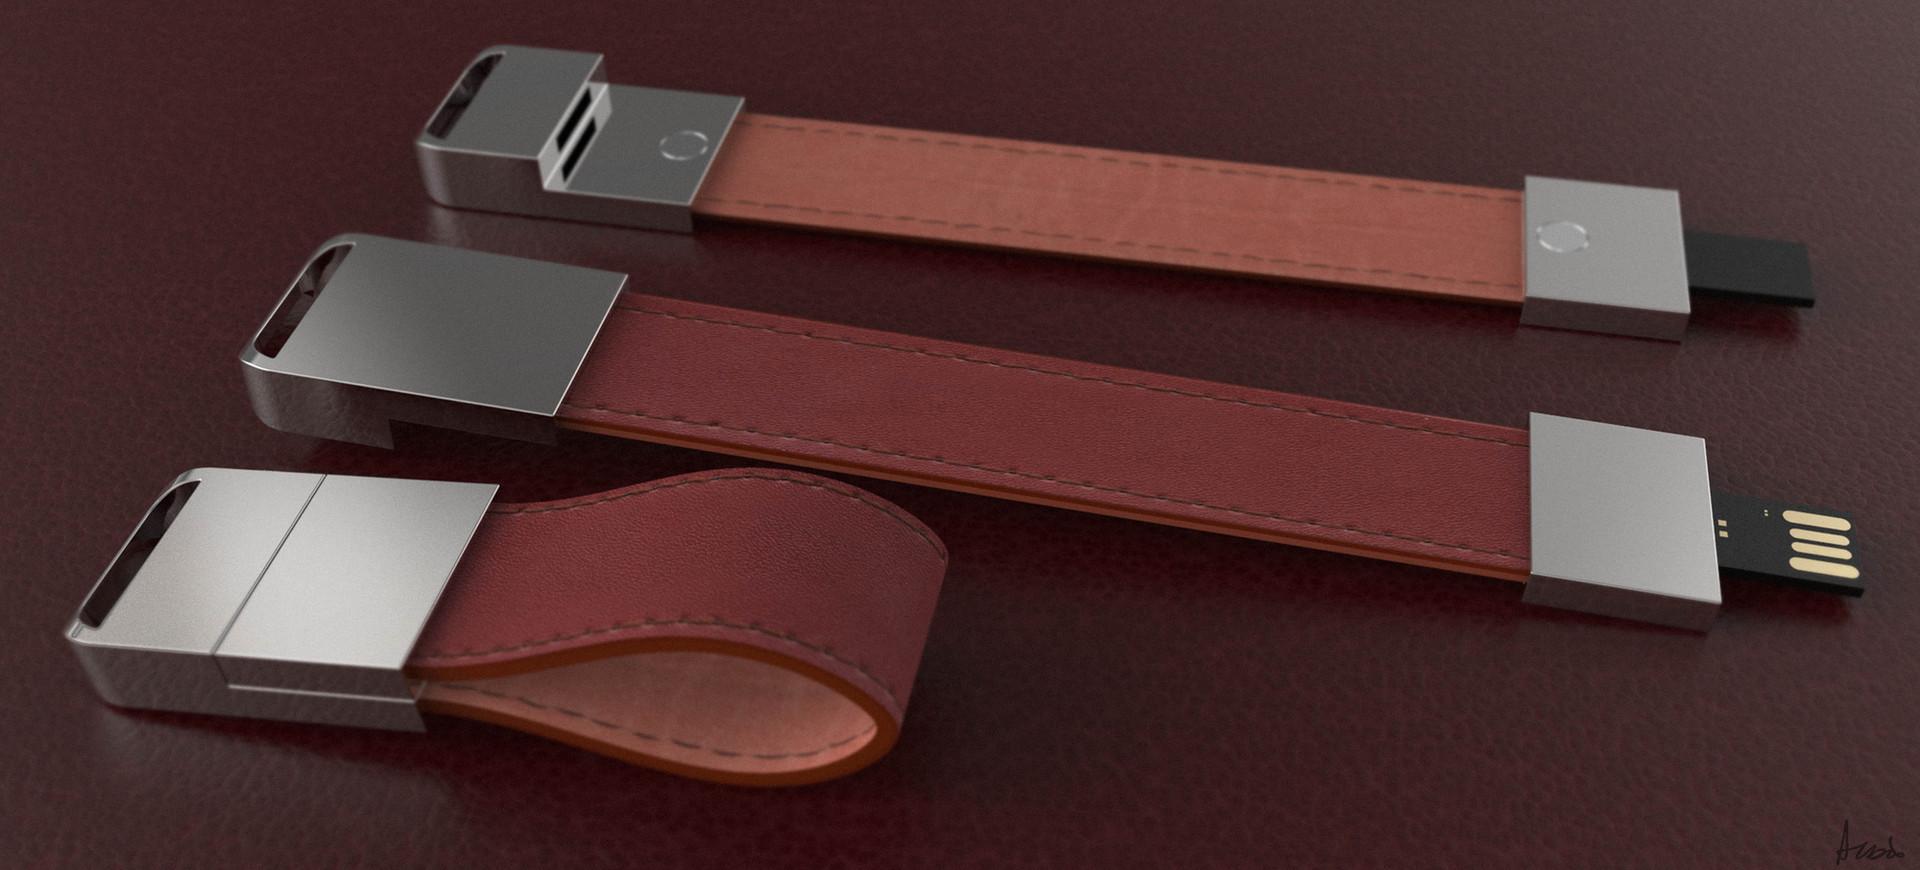 leather usb.jpg